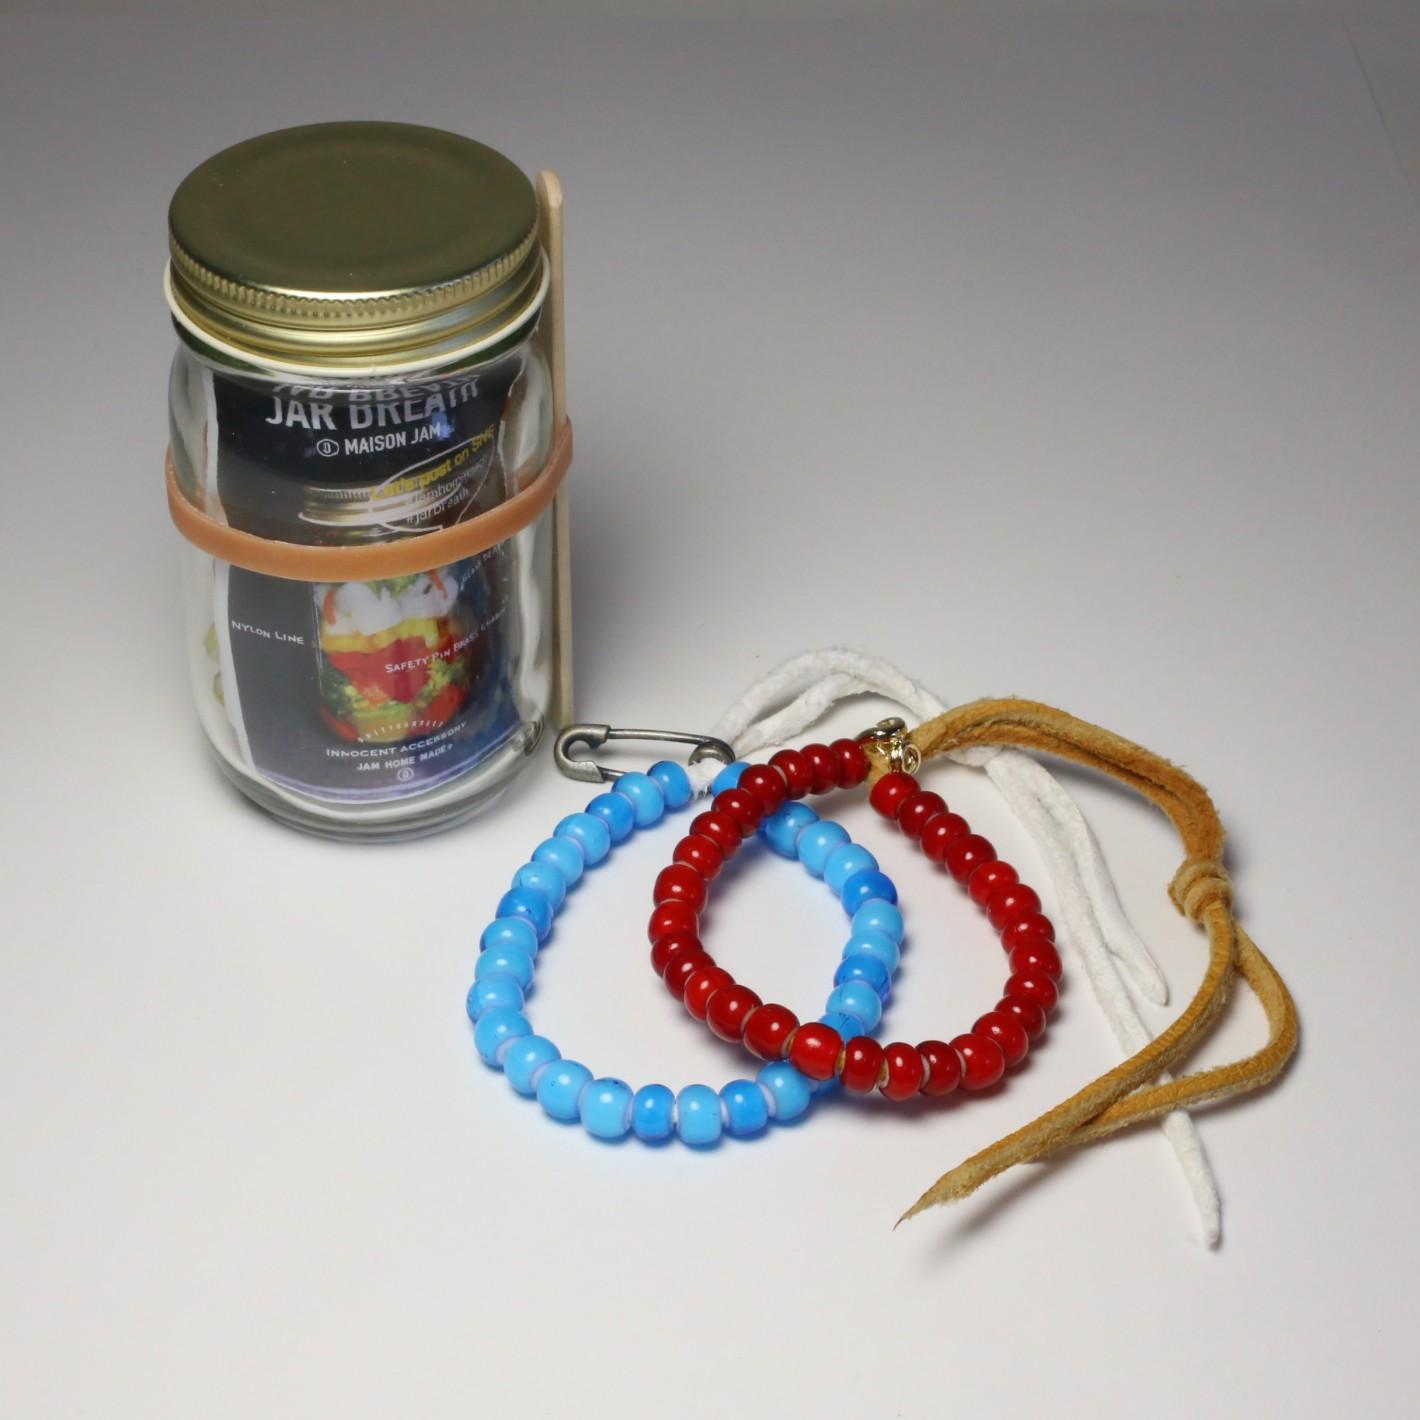 JAR_BREATH_beads